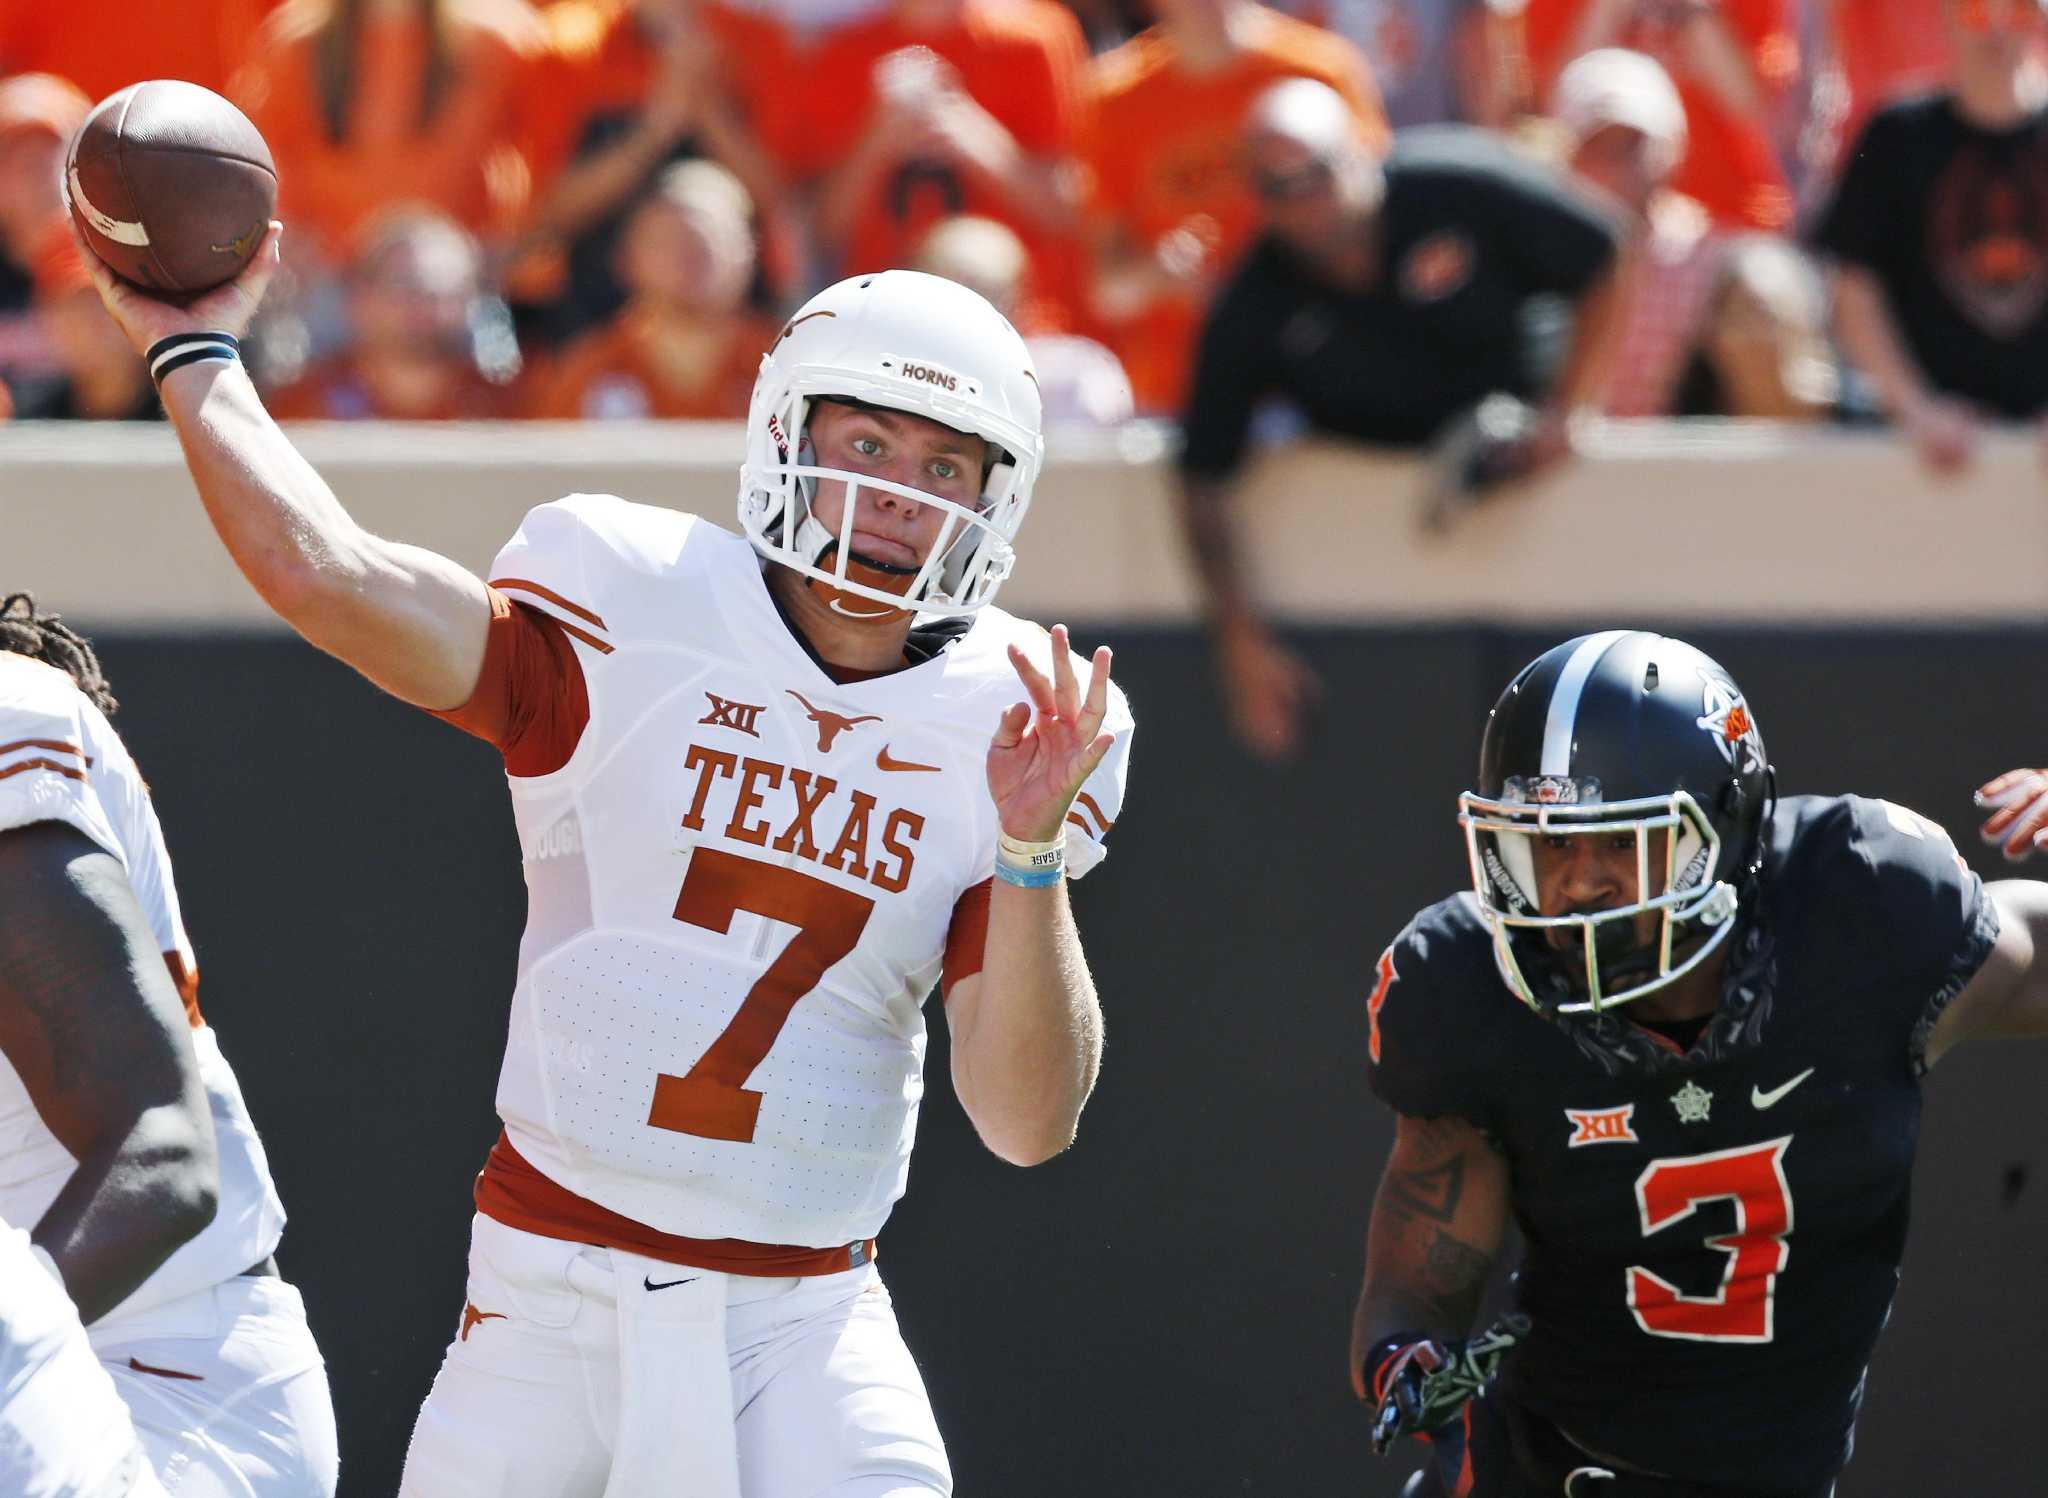 Texas QB battle still hasnt been decided